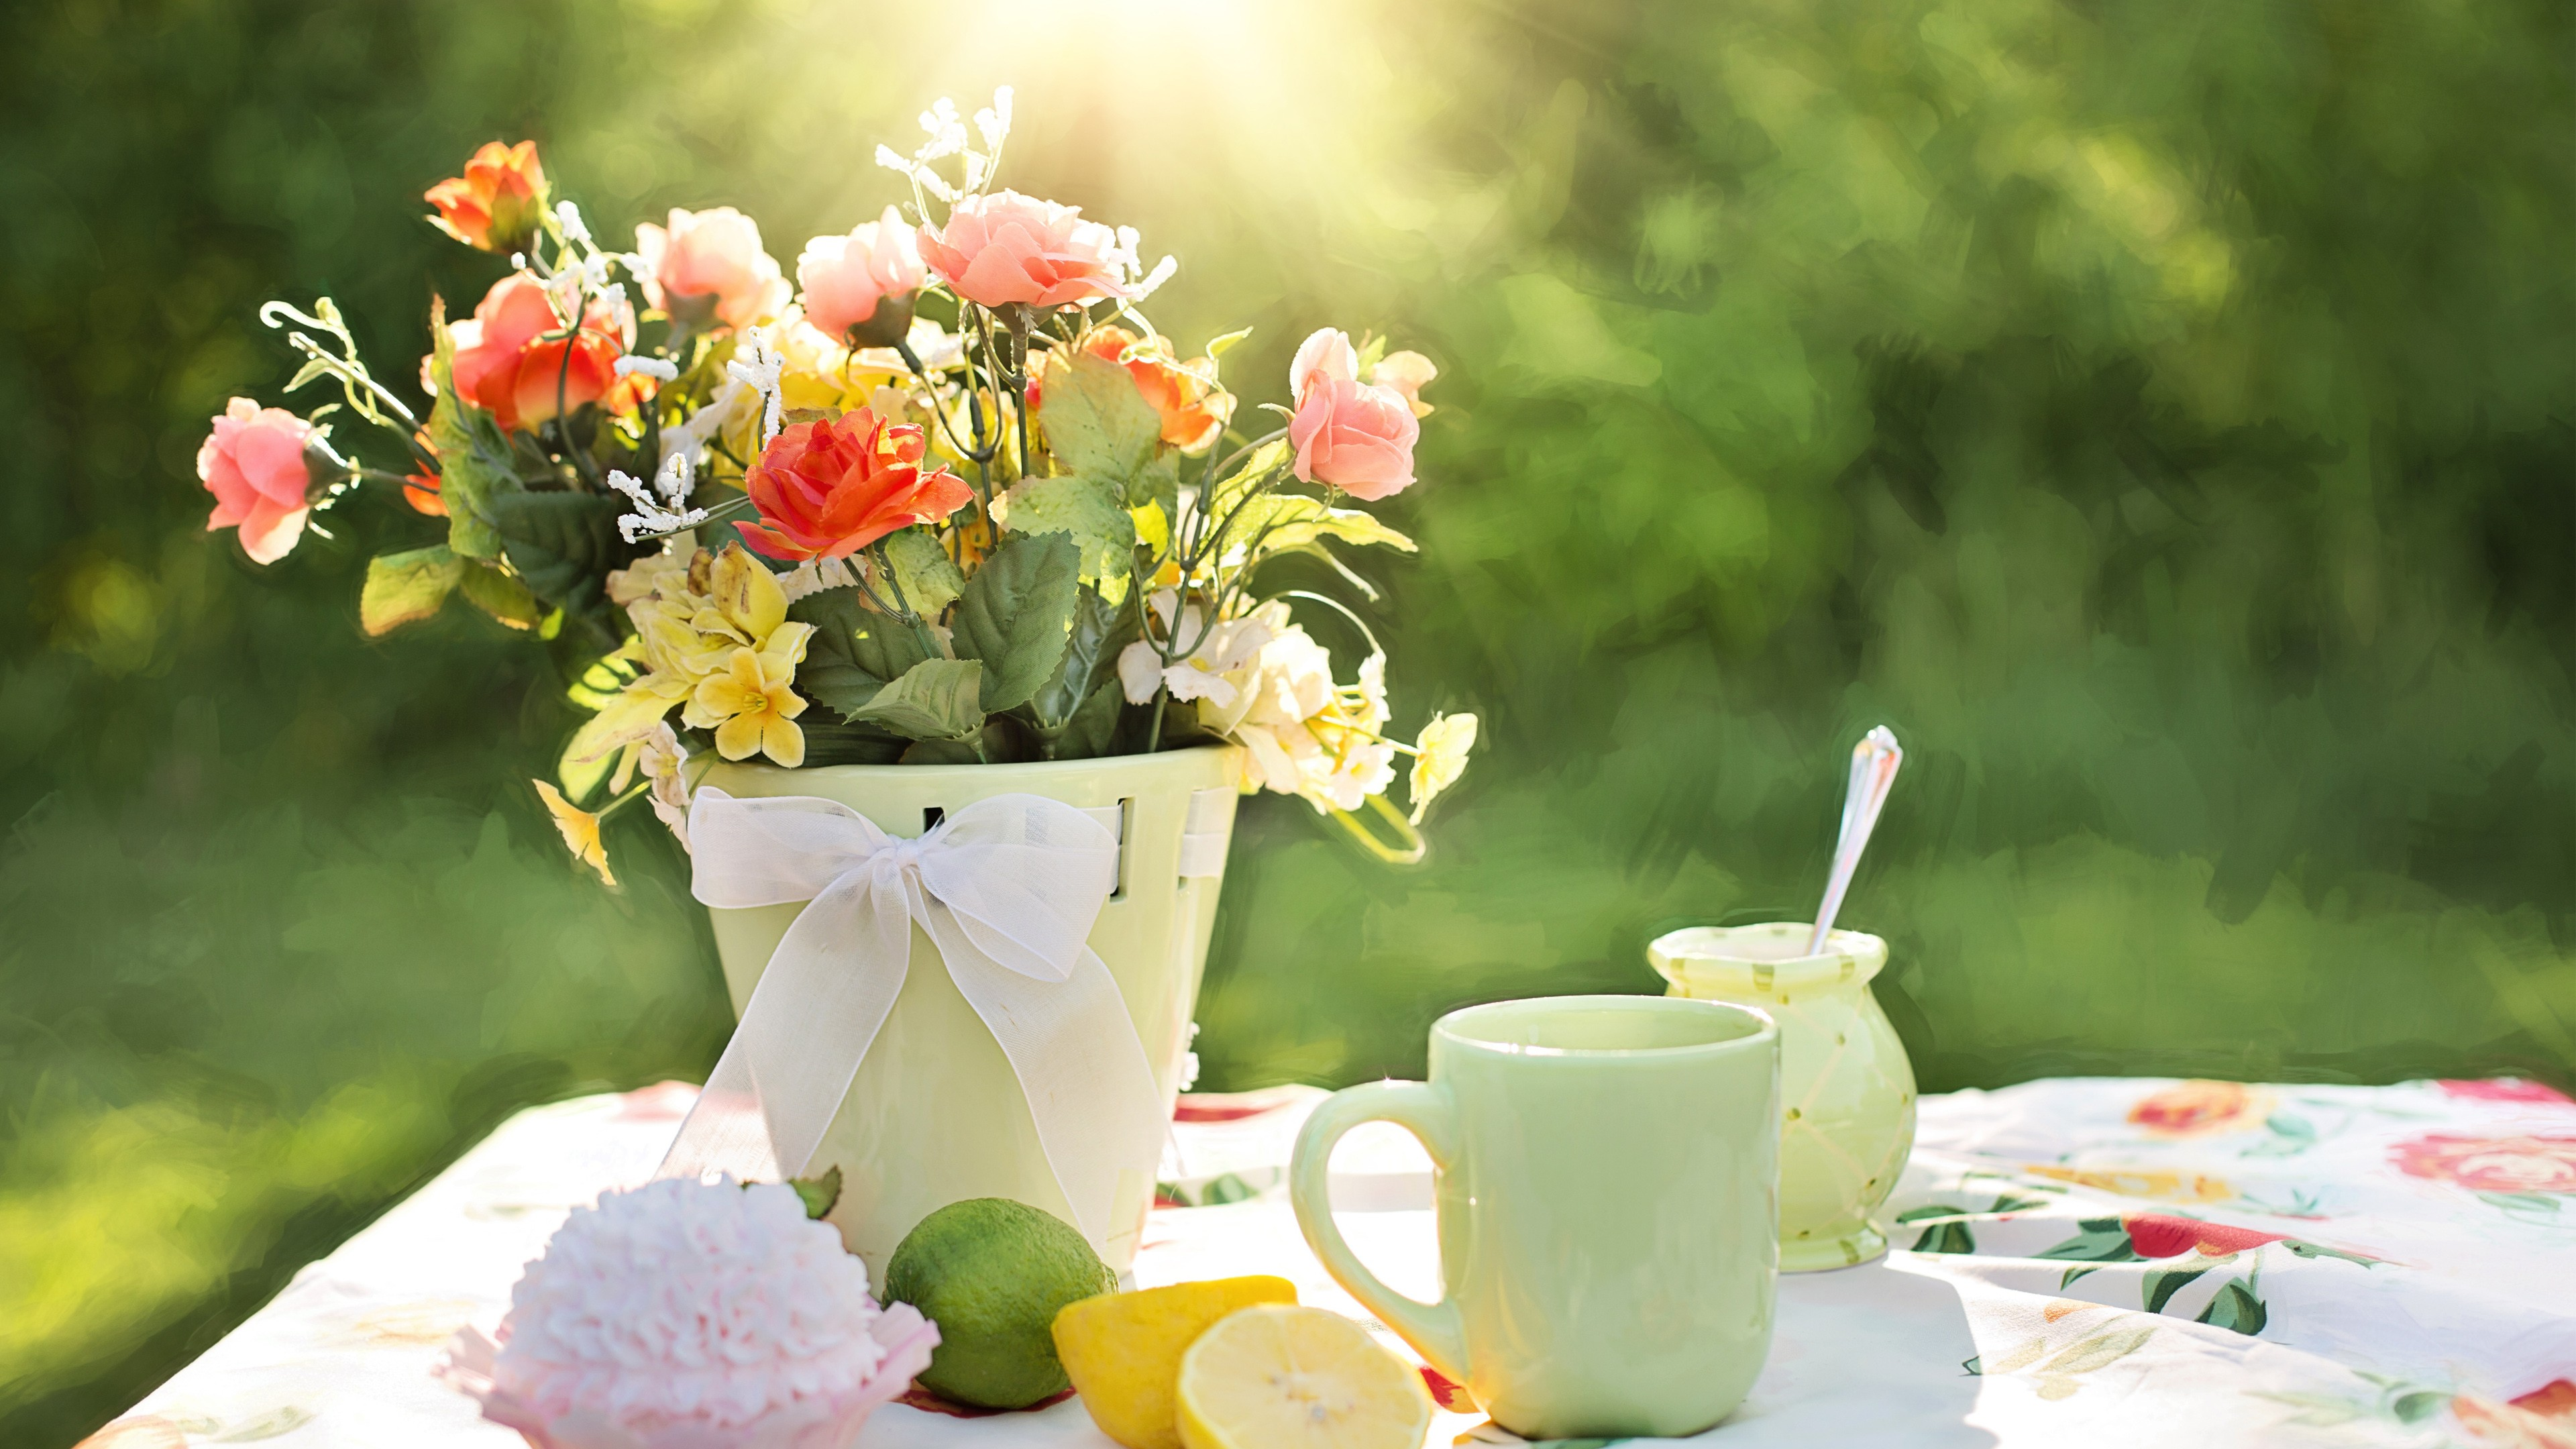 Good Wallpaper Mac Spring - spring-flowers-3840x2160-4k-hd-wallpaper-summer-flowers-summer-sun-10140  Perfect Image Reference_274156.jpg